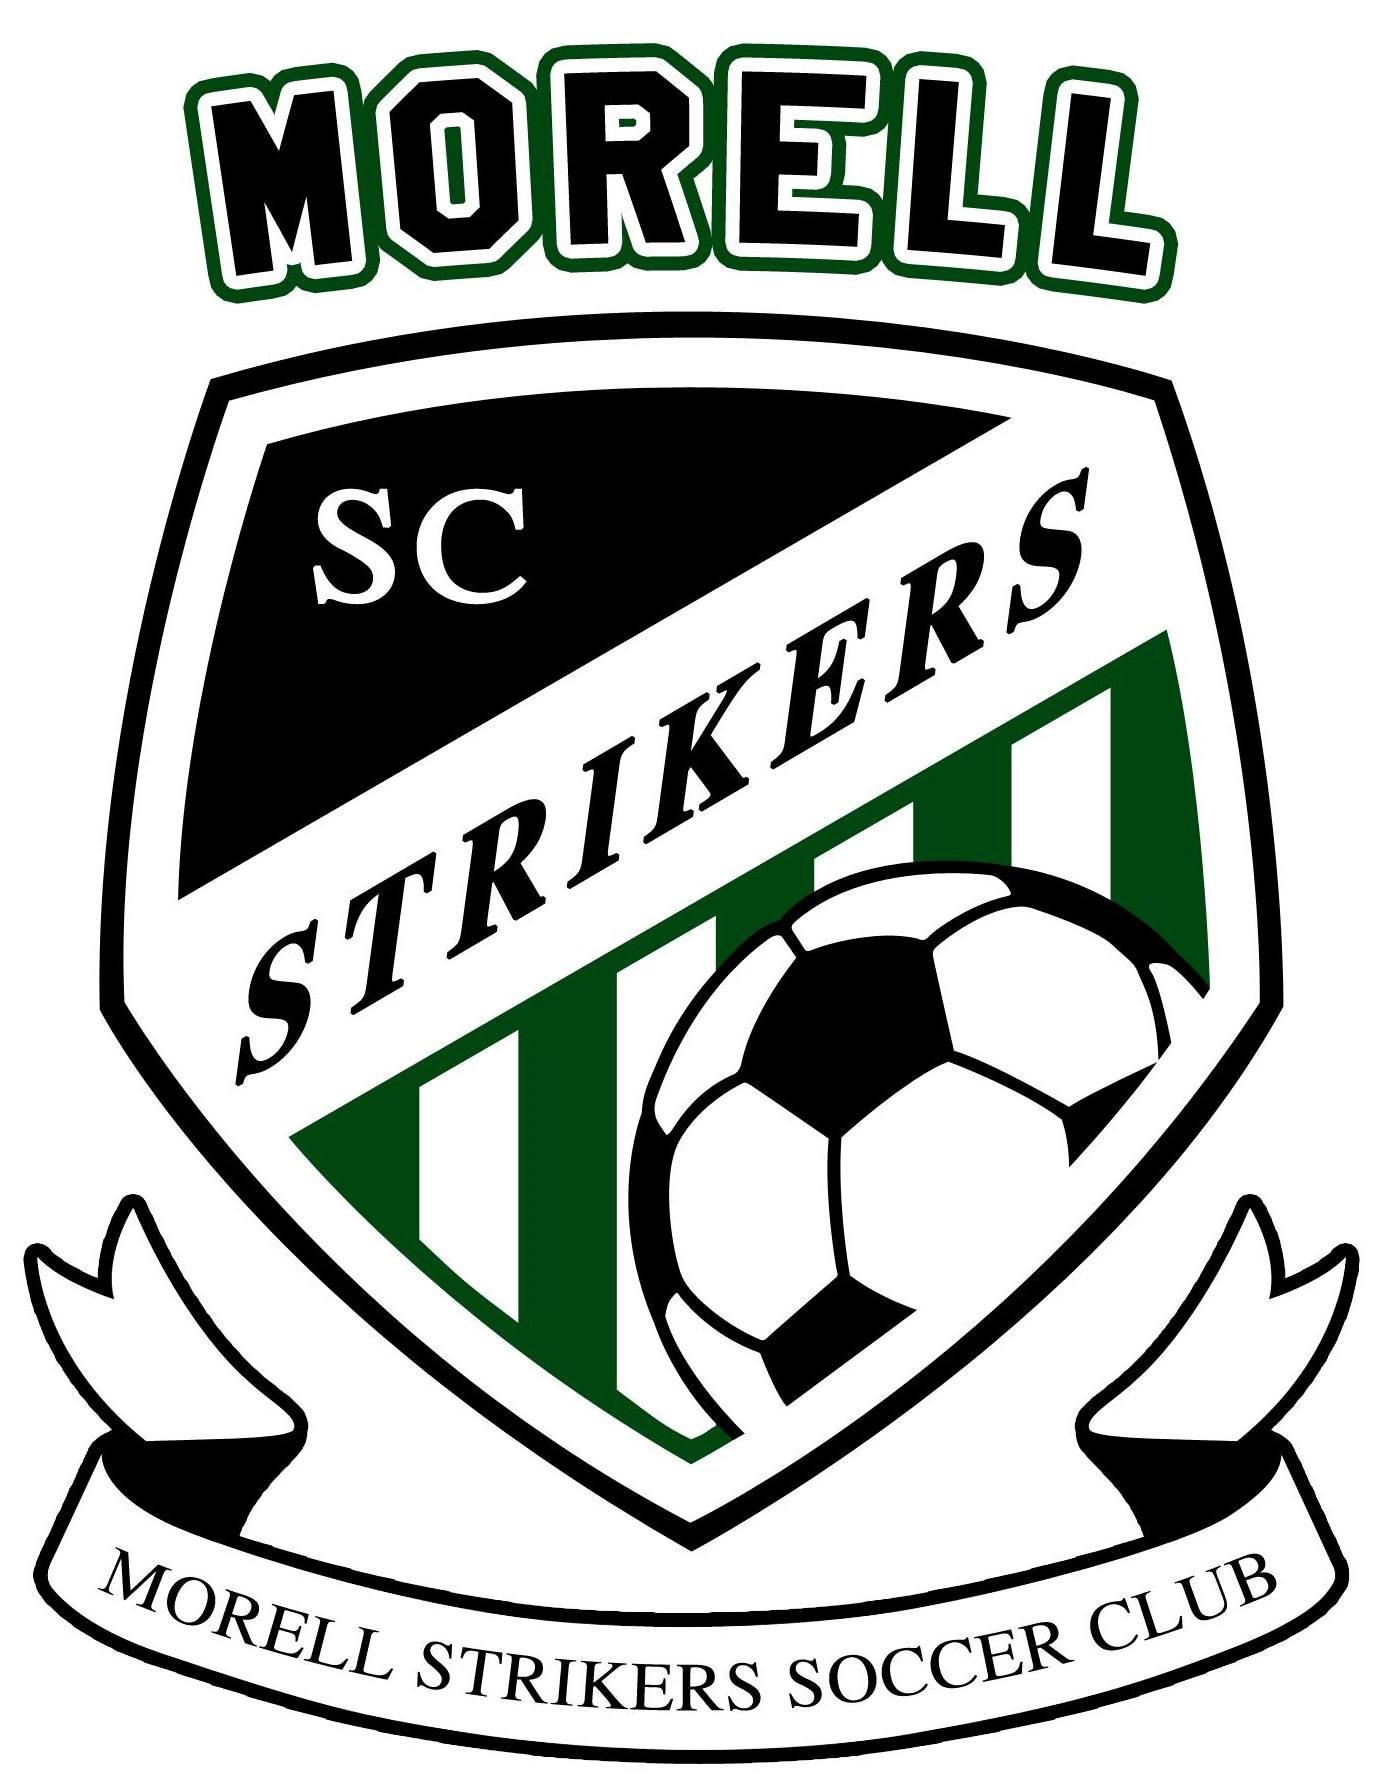 Morell Strikers Logo